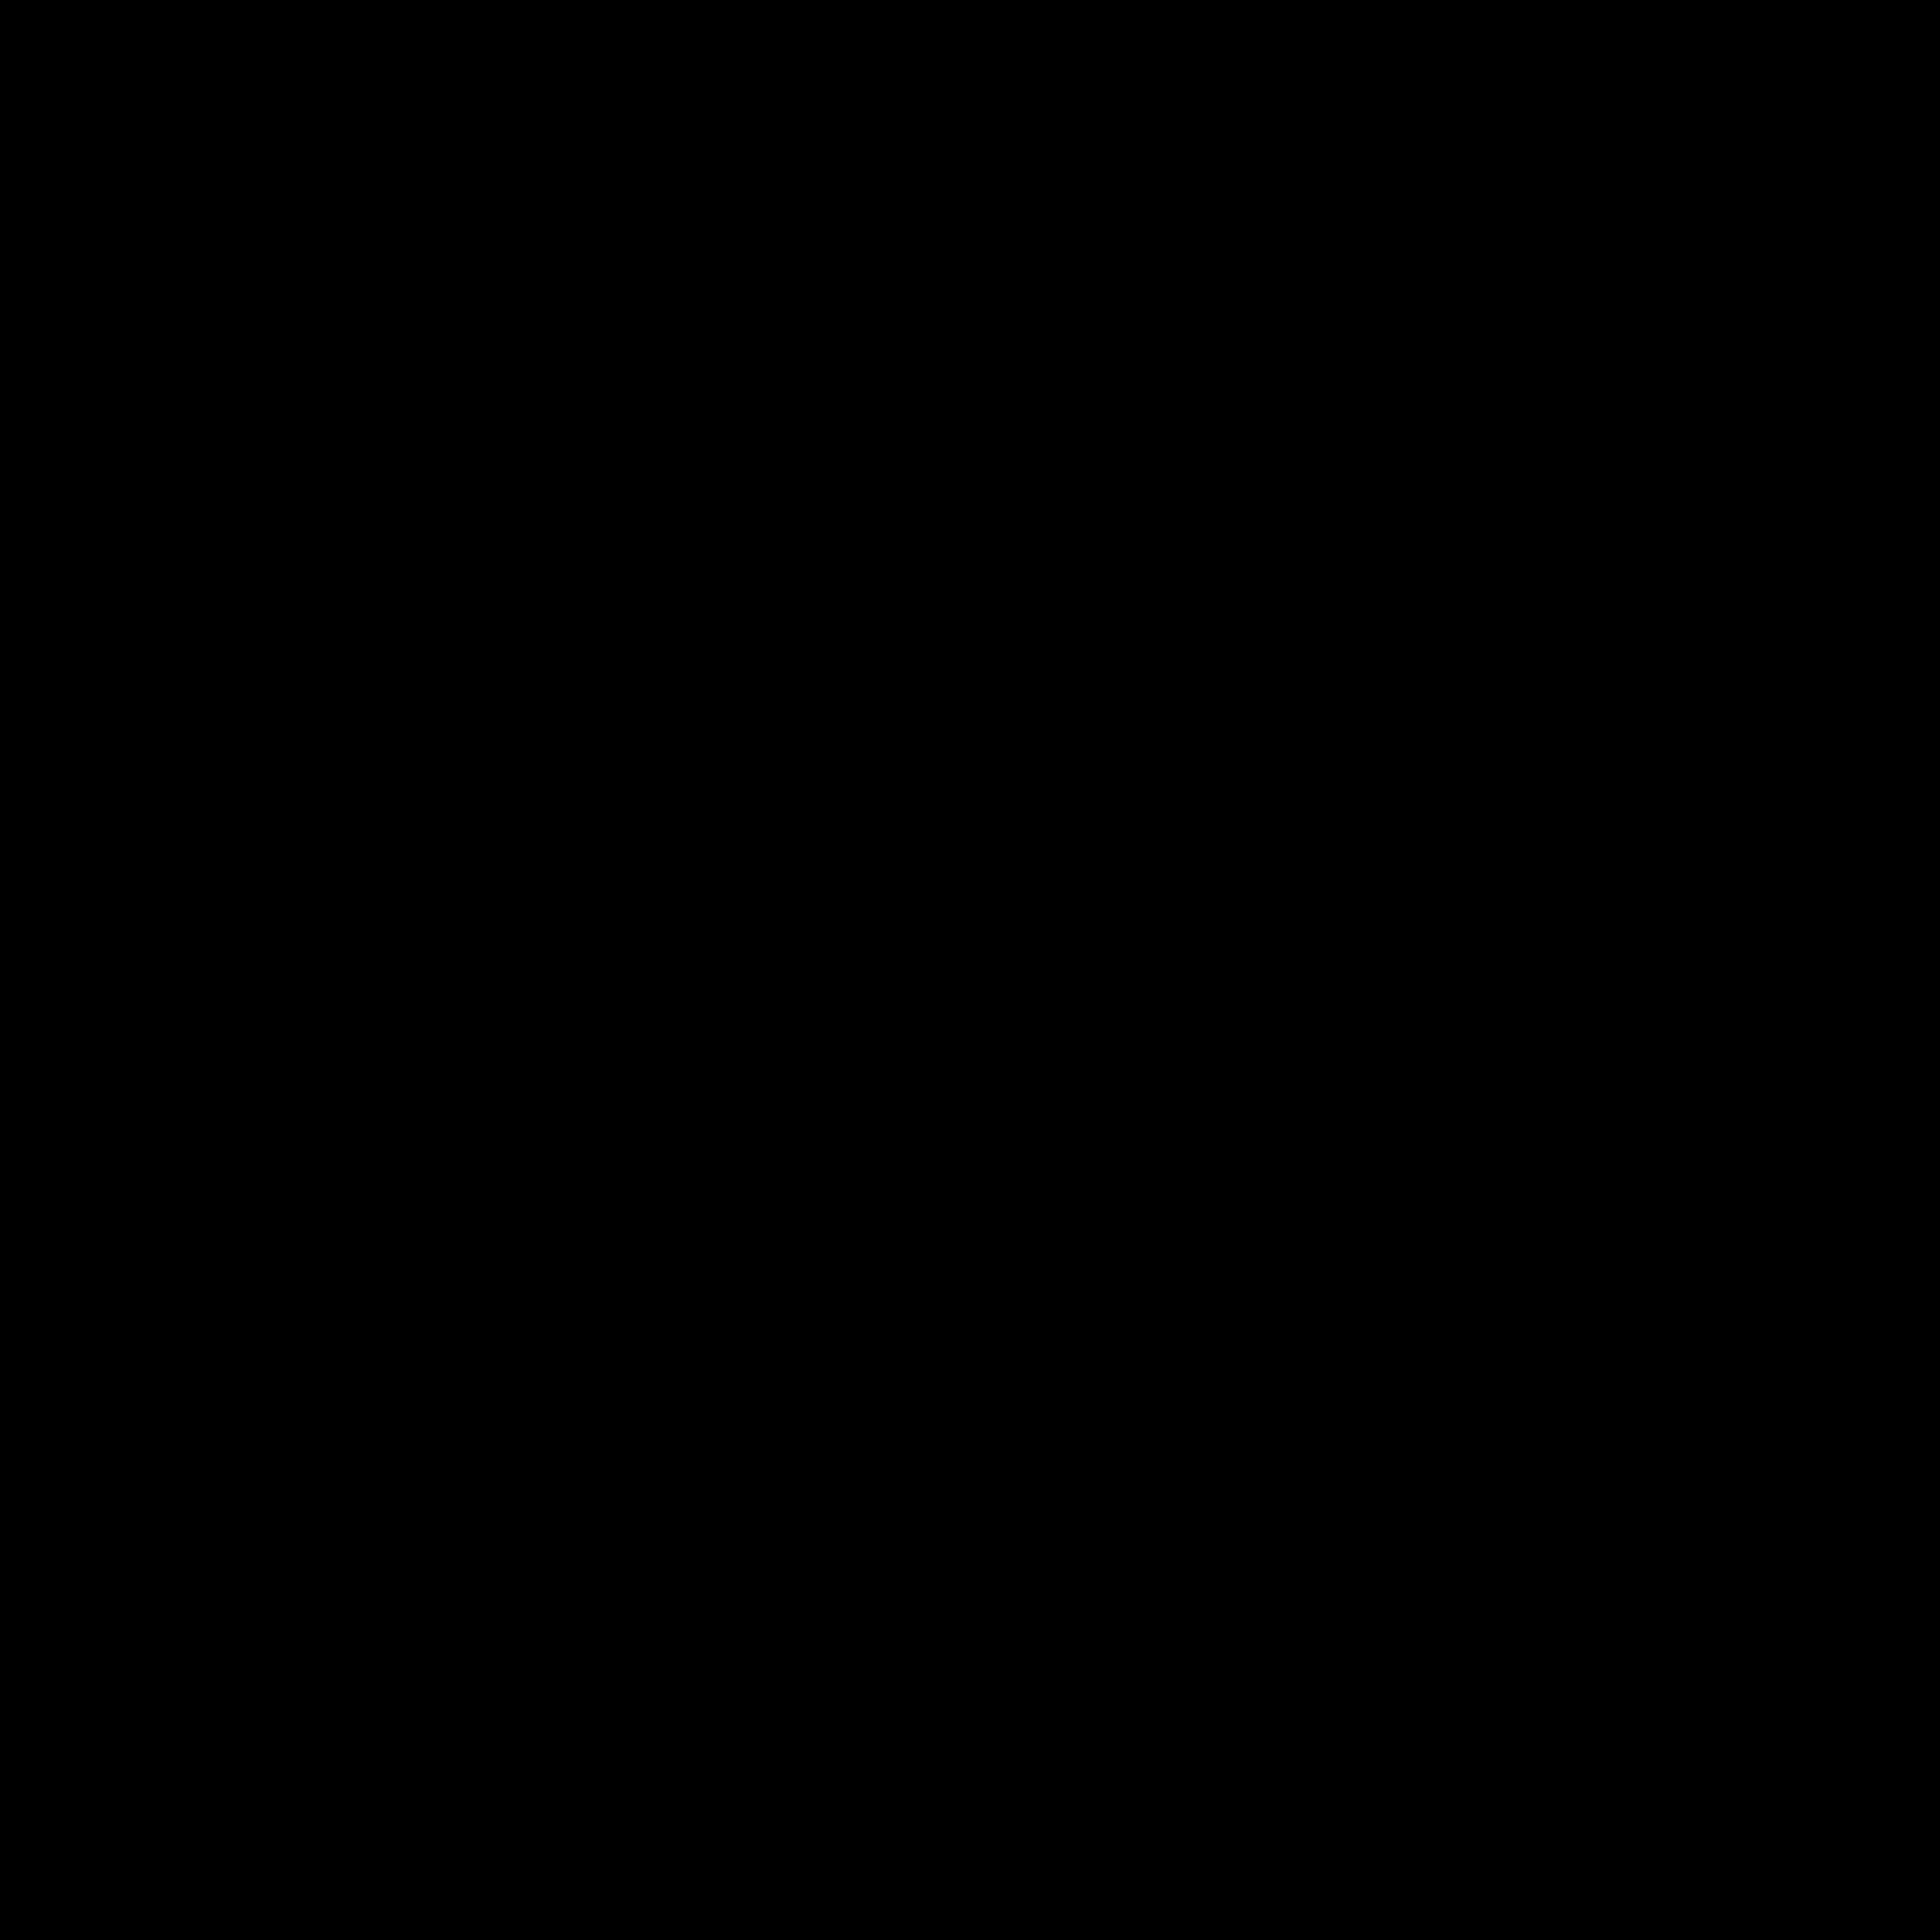 Alfred Dunhill 01 Logo PNG Transparent & SVG Vector.